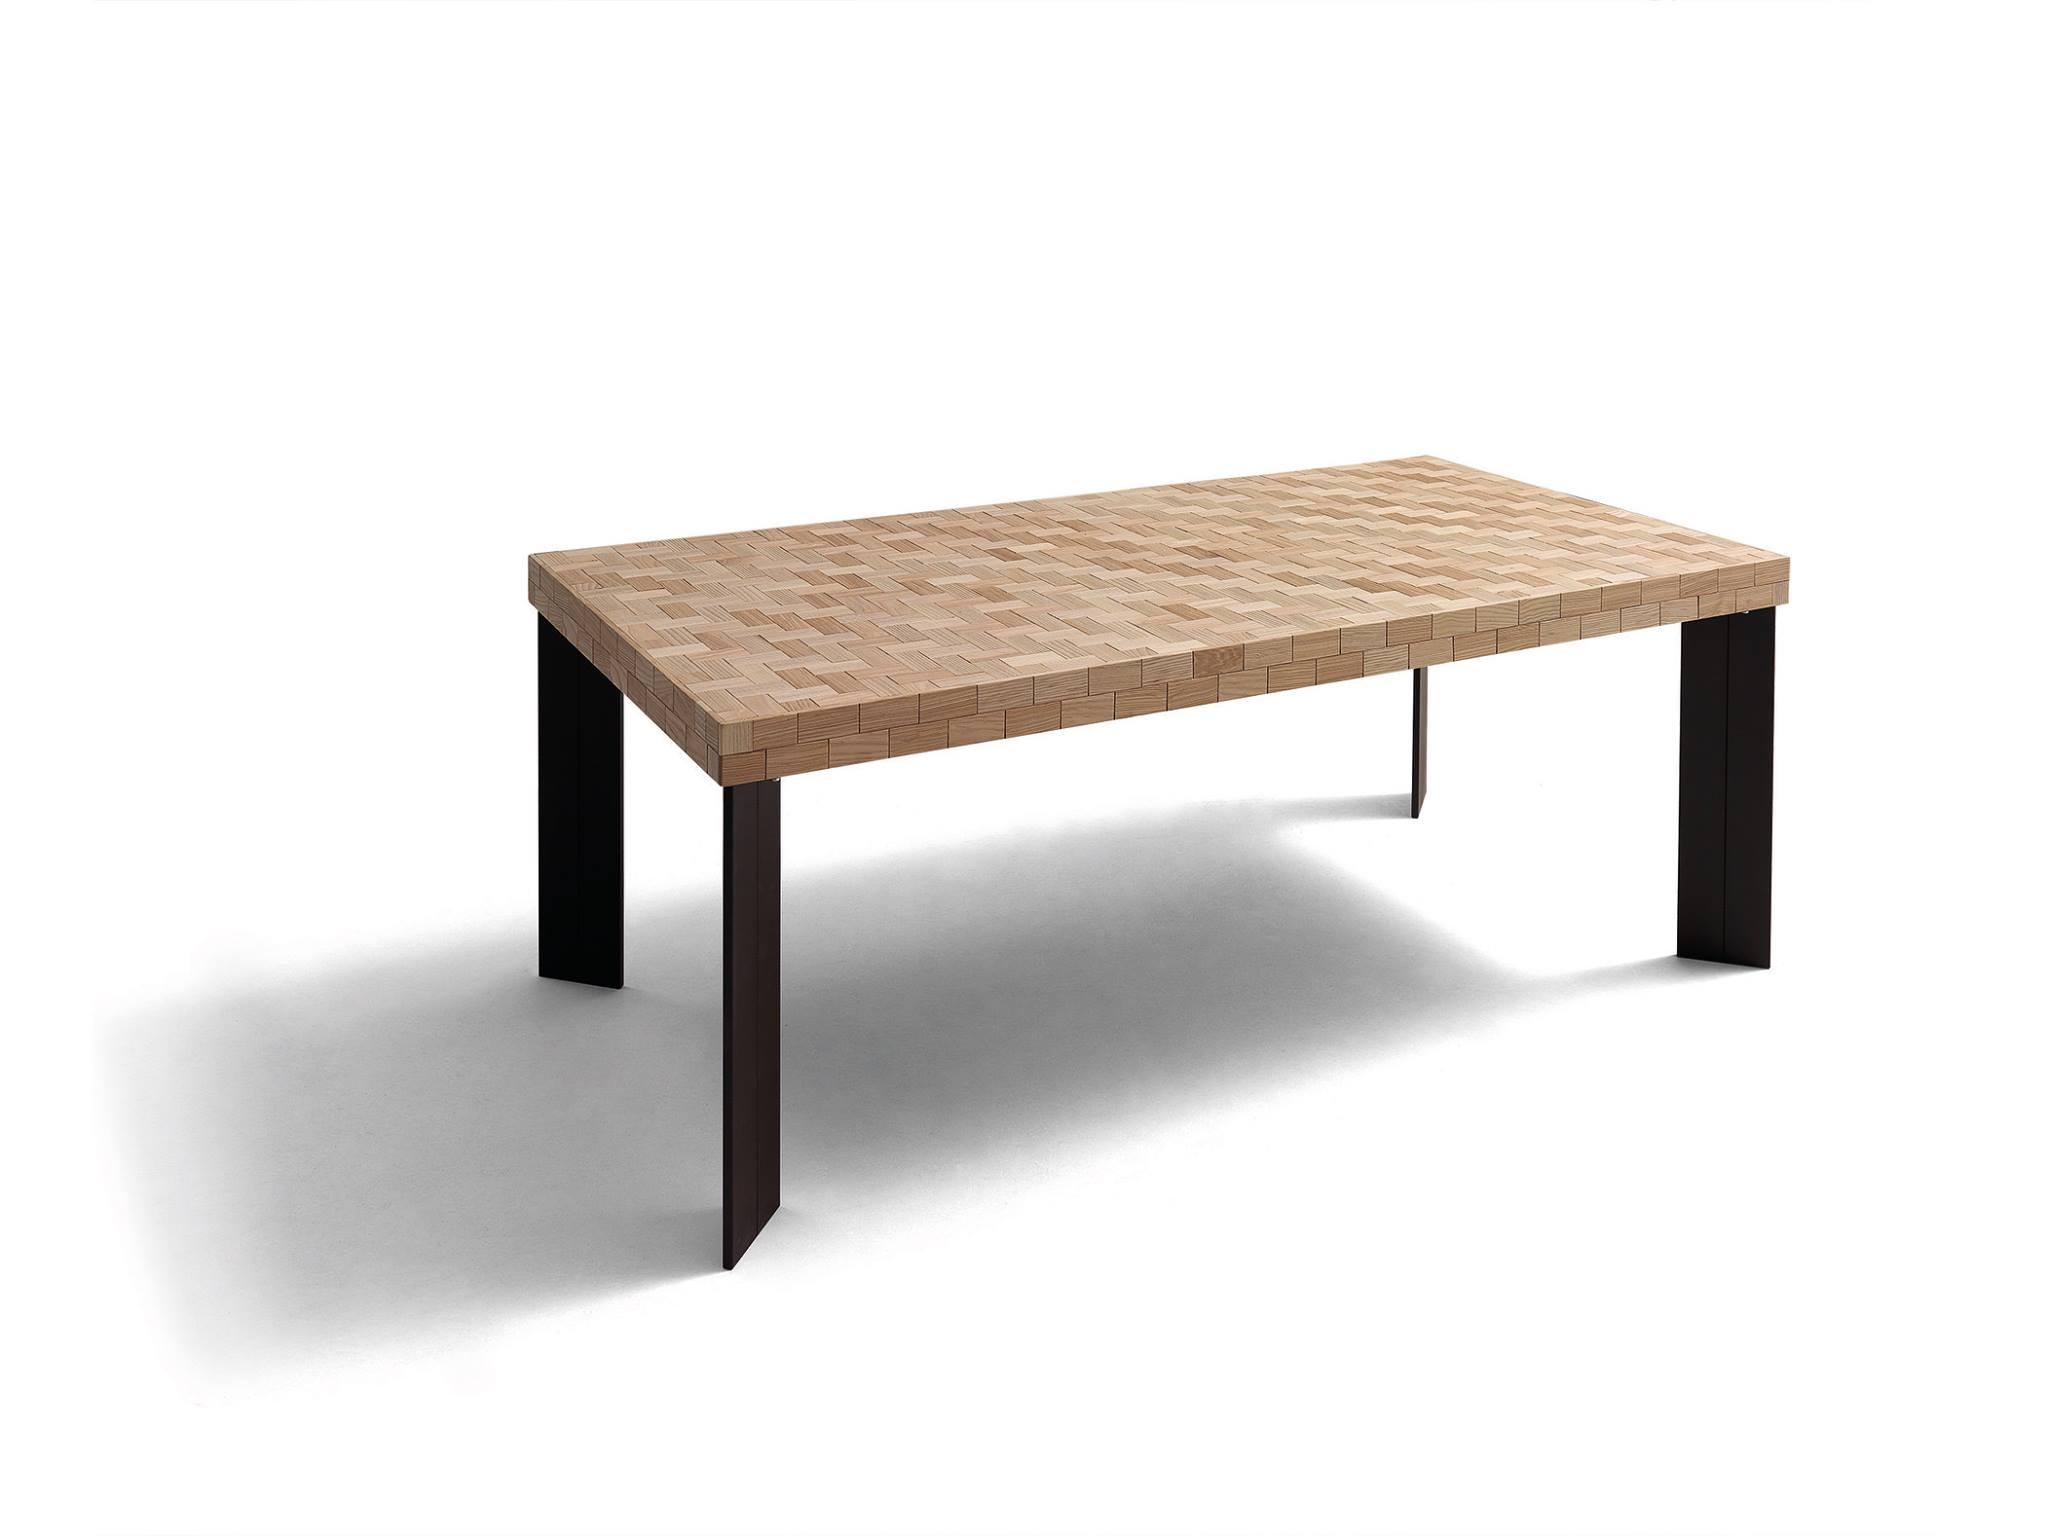 Mesa de comedor actual tapa puzle y pata recta metal óxido